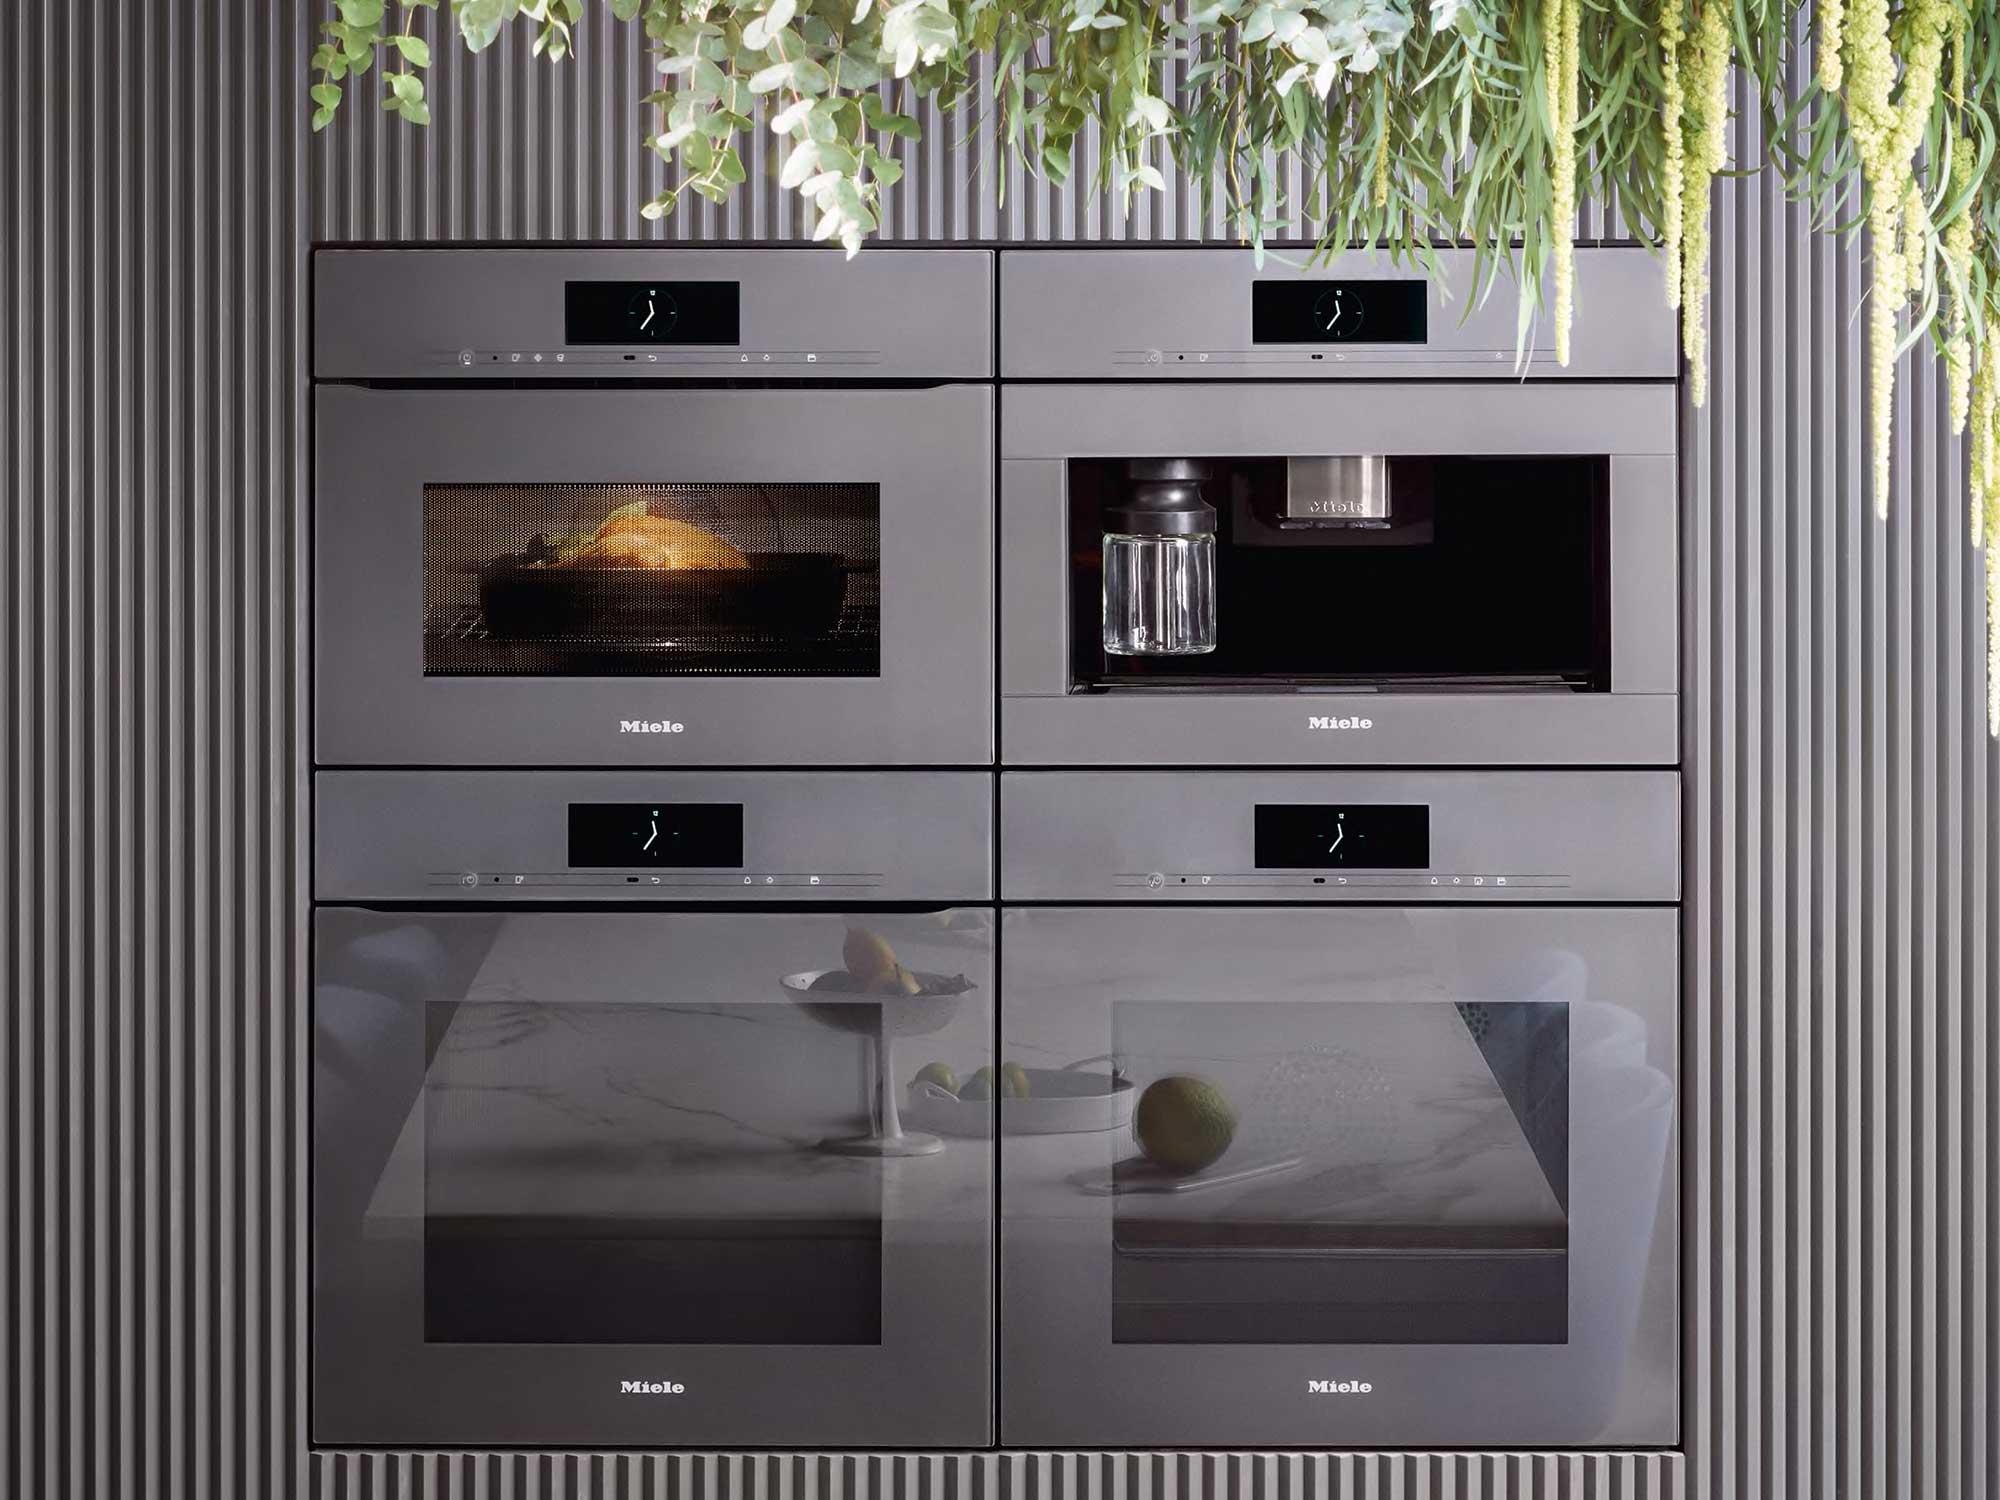 Miele ovens kitchen appliances